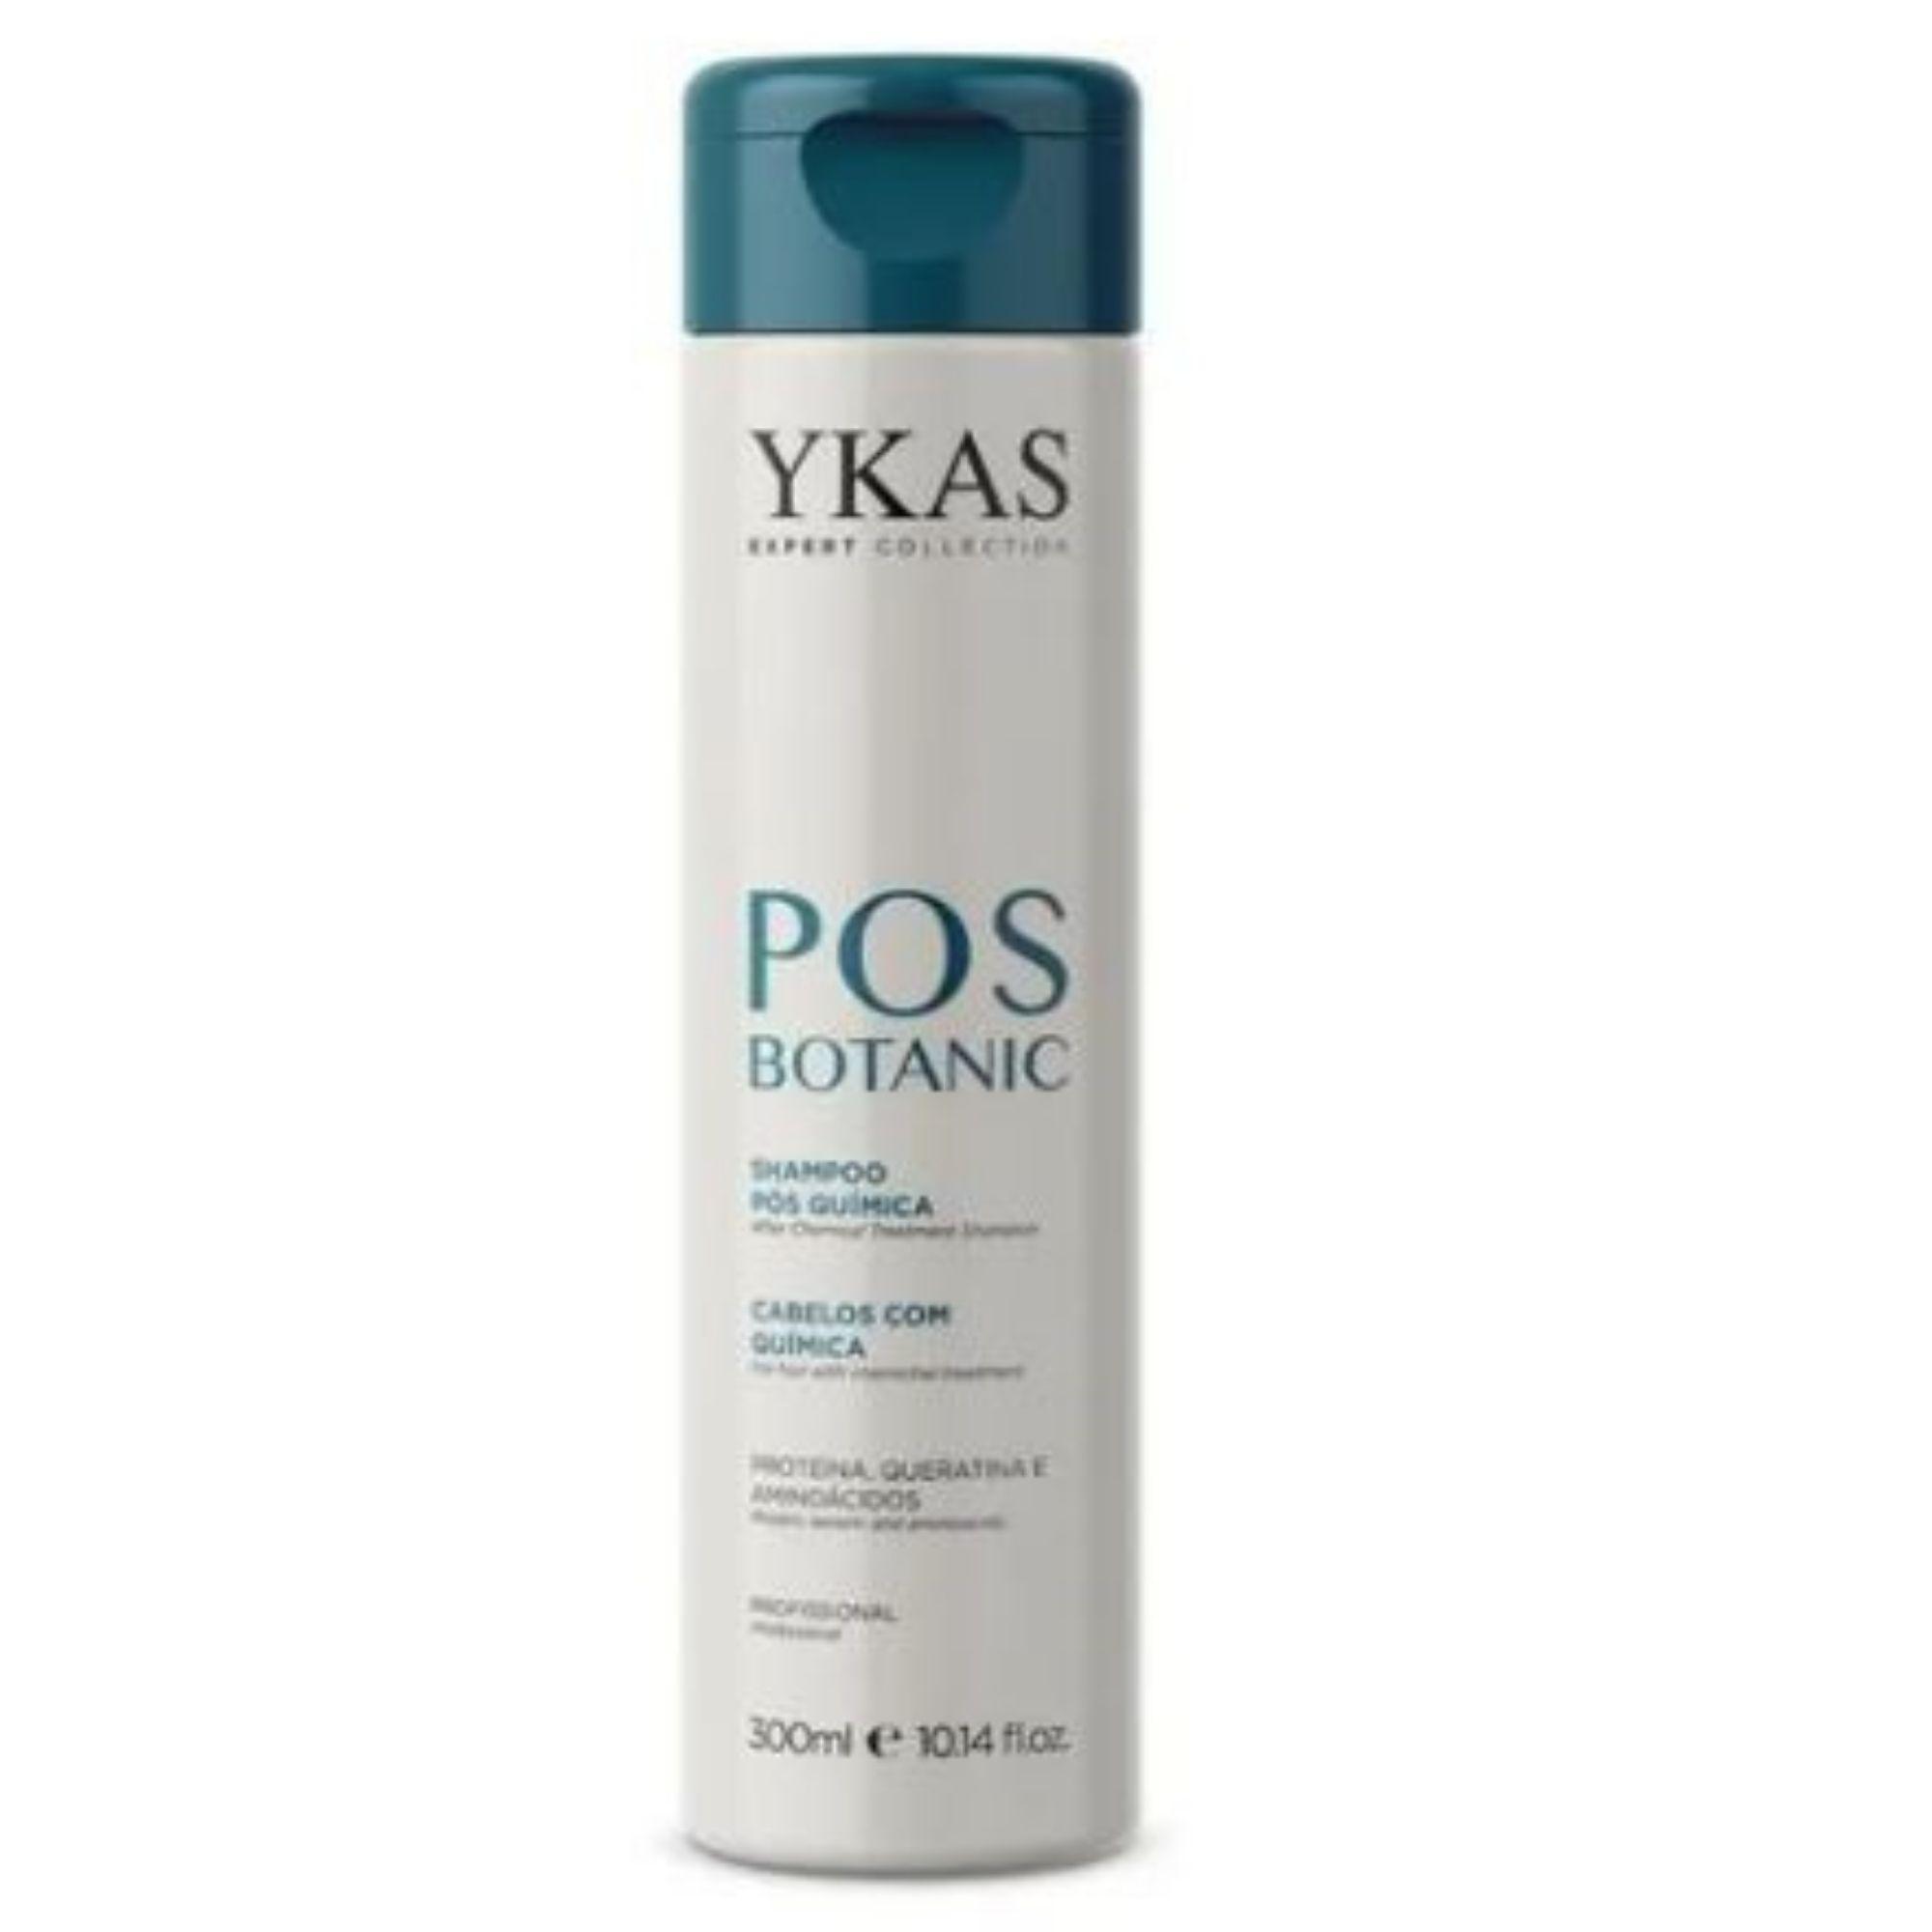 Ykas Botanic  Pós Quimica Shampoo 300ml